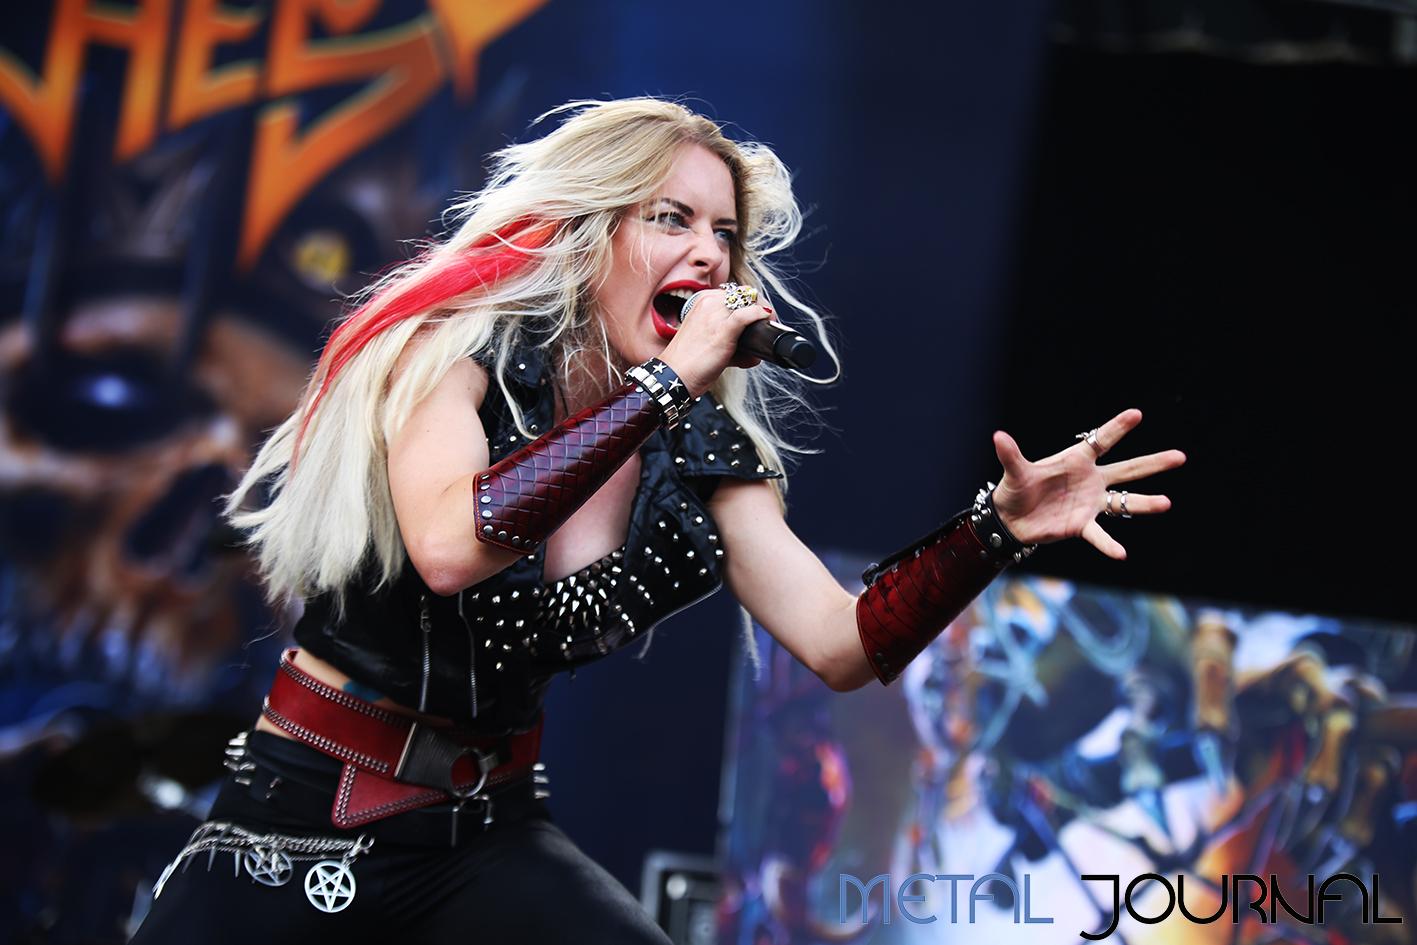 burning witches - leyendas del rock 2019 metal journal pic 1